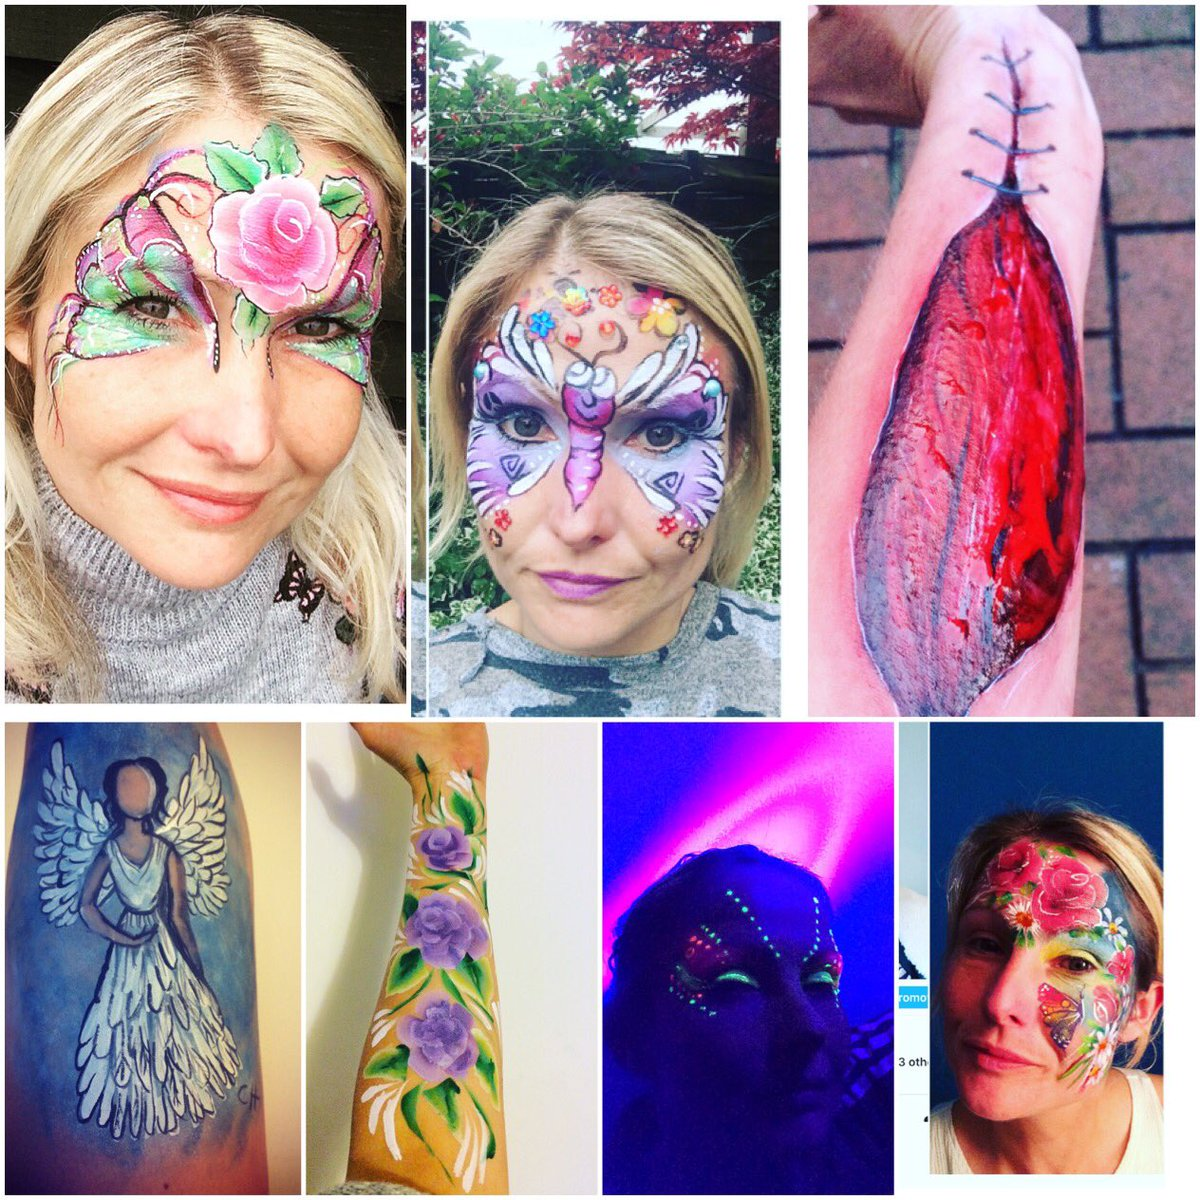 #facepaint #facepainter #Flowers #roses2017 #clubbing #sfx #butterfly @SillyFarm @facepaintchelt inspired #uv #angel<br>http://pic.twitter.com/P09HGHwNB4